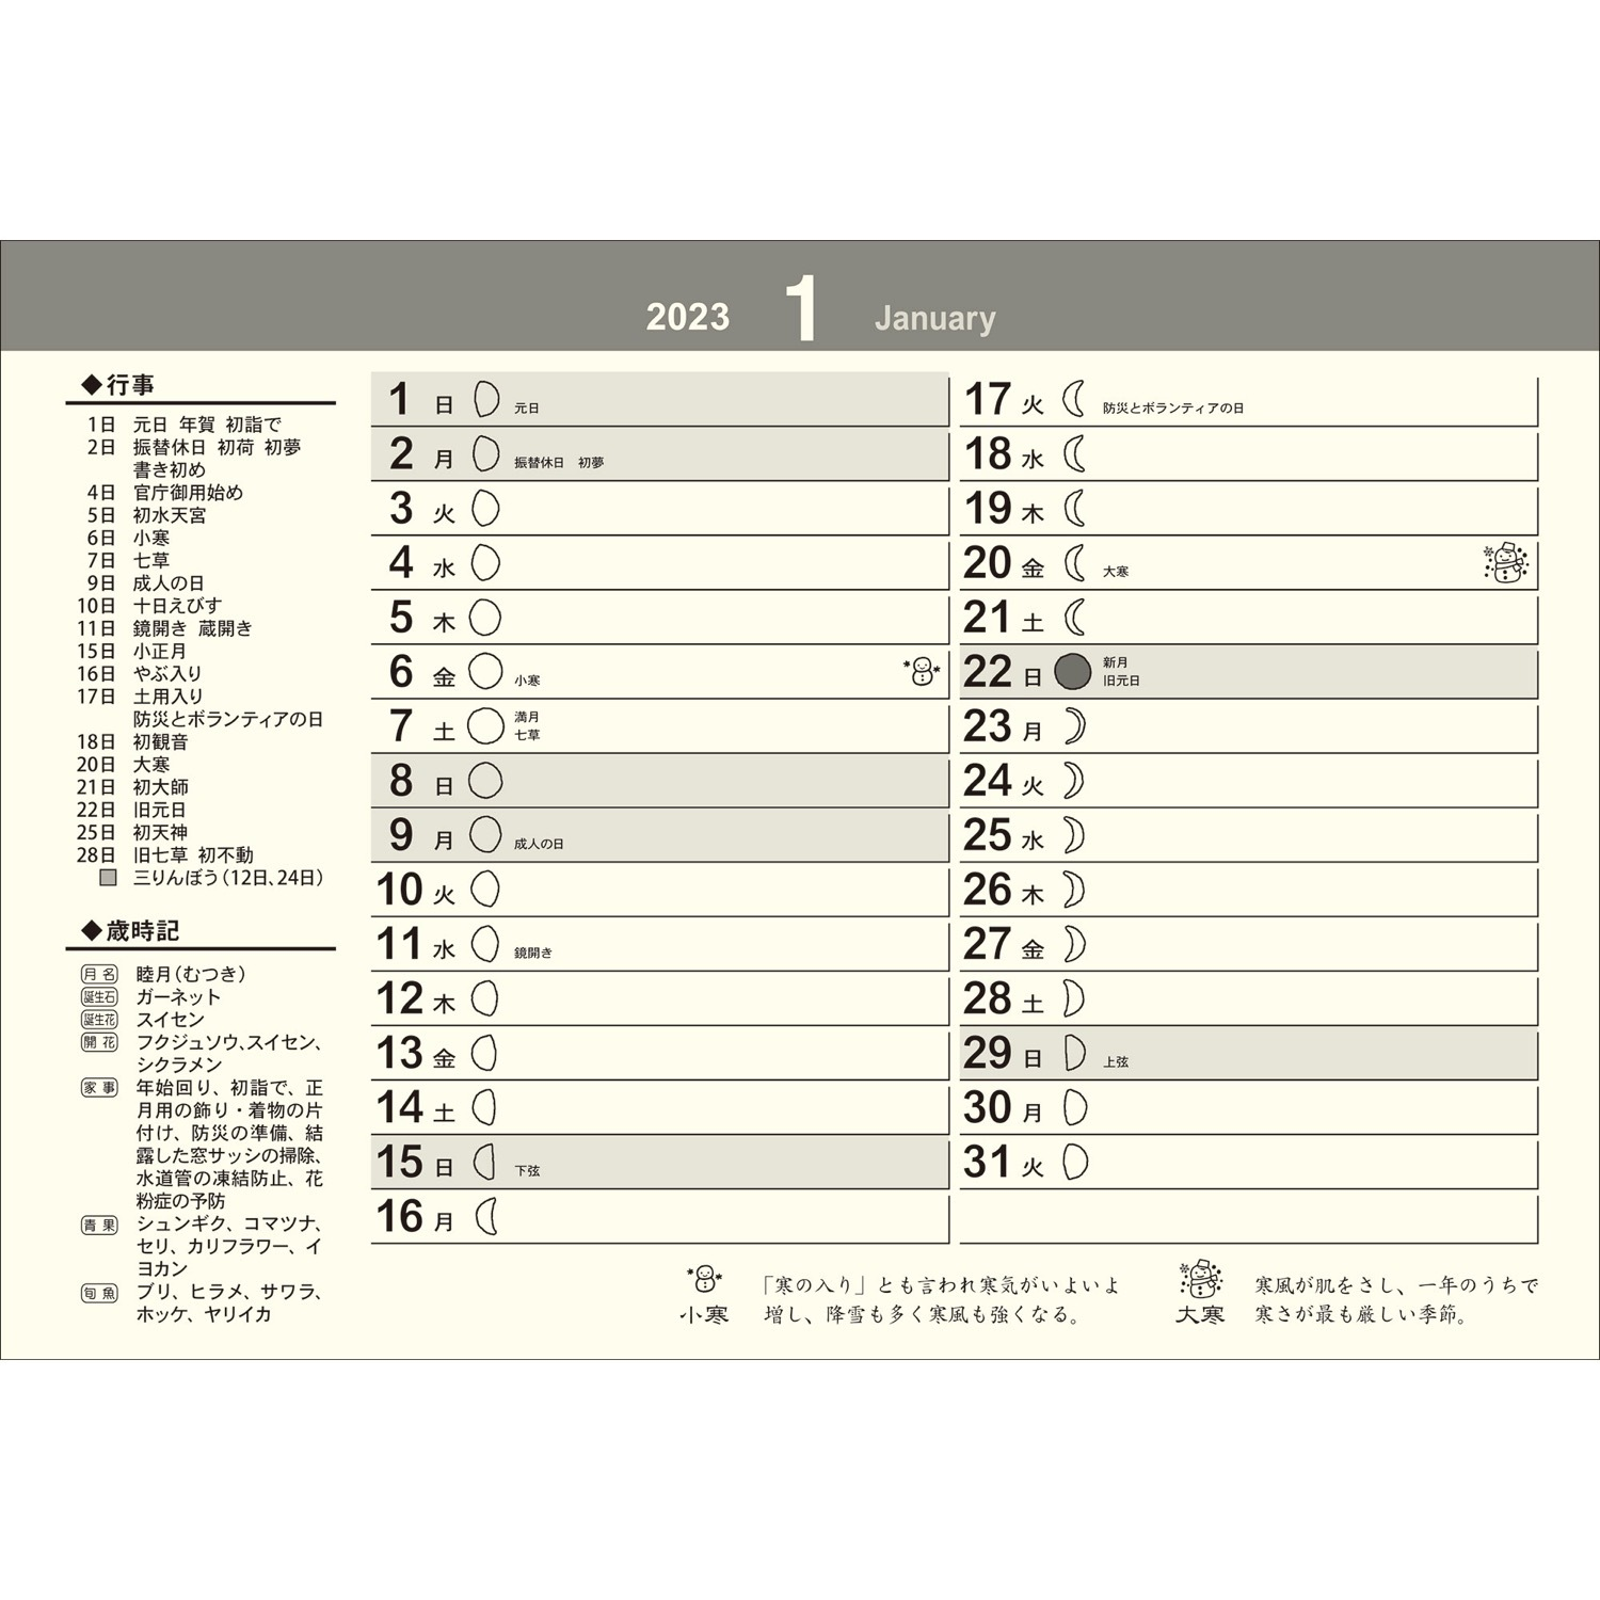 TD-30268 卓上L・楽笑〜笑顔になれる書画ごよみ〜(2021年版)